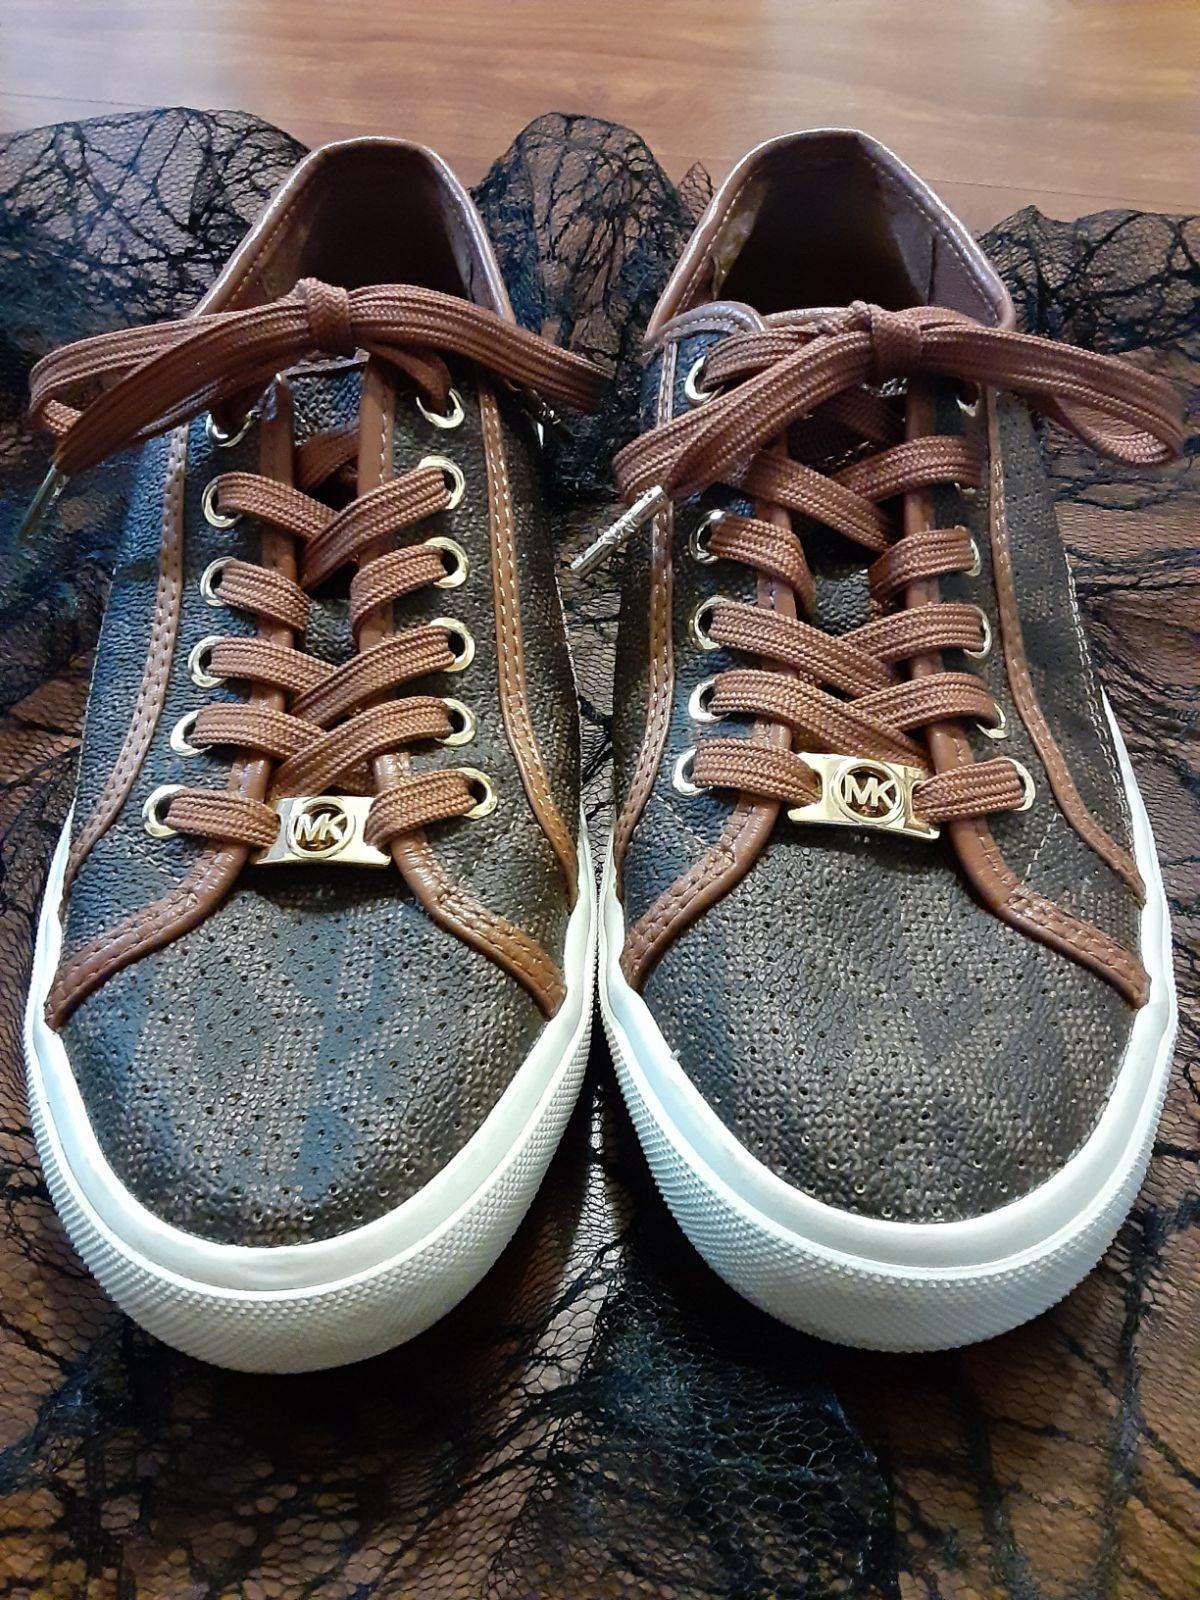 Michael Kors Monigram Sneakers